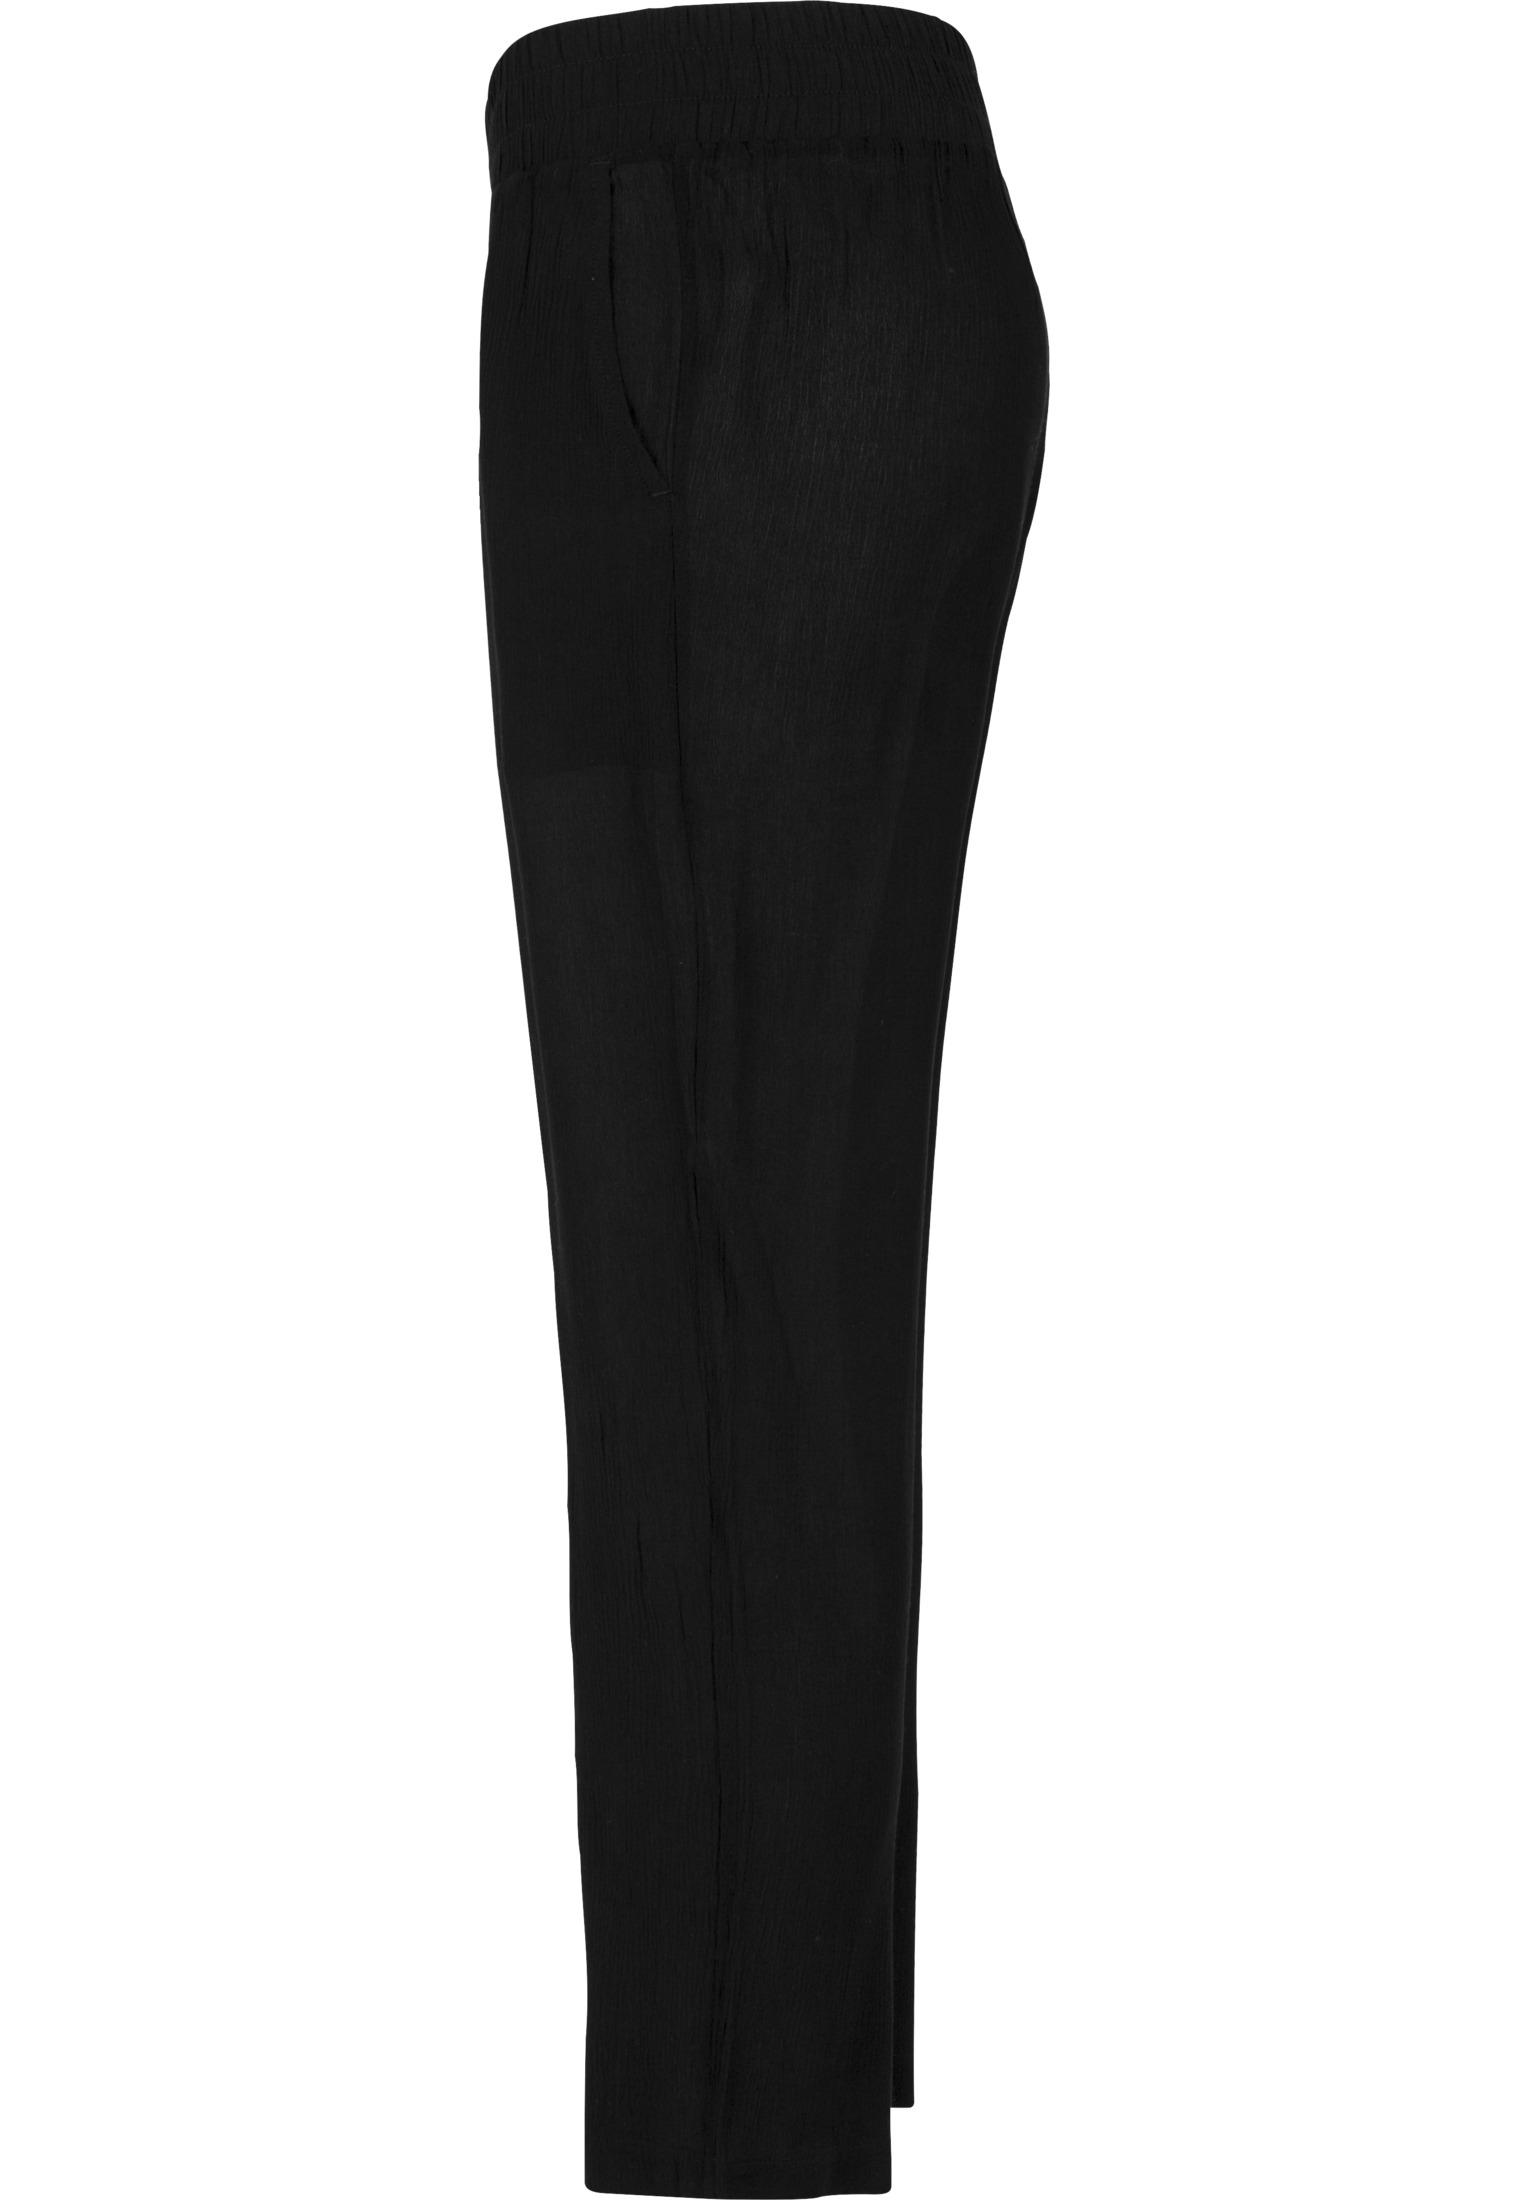 Urban Classics Damen Hose Ladies Beach Pants